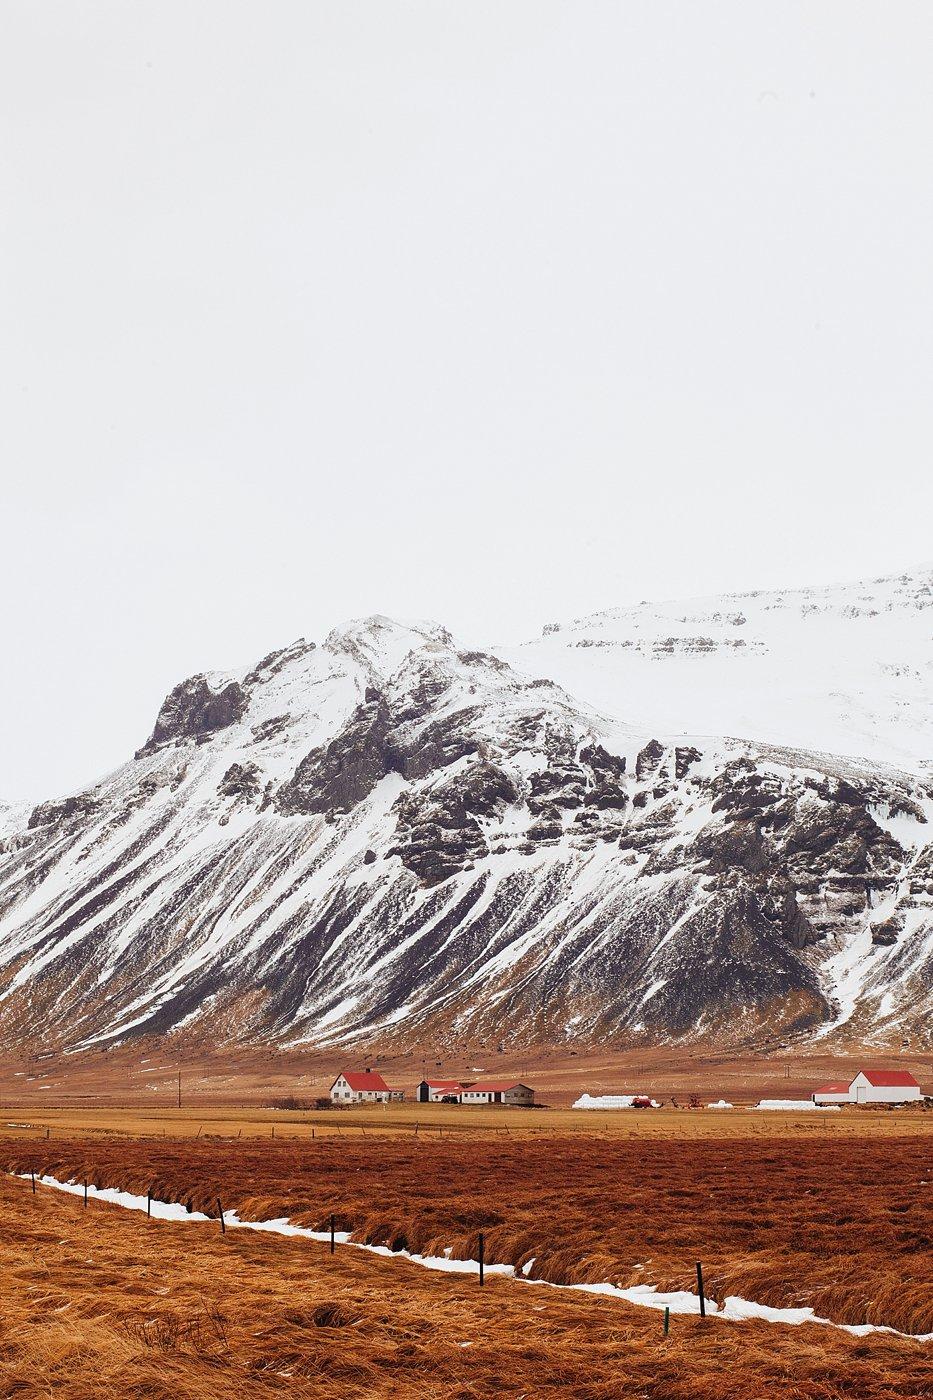 APitts_Iceland-4279 copy.jpg